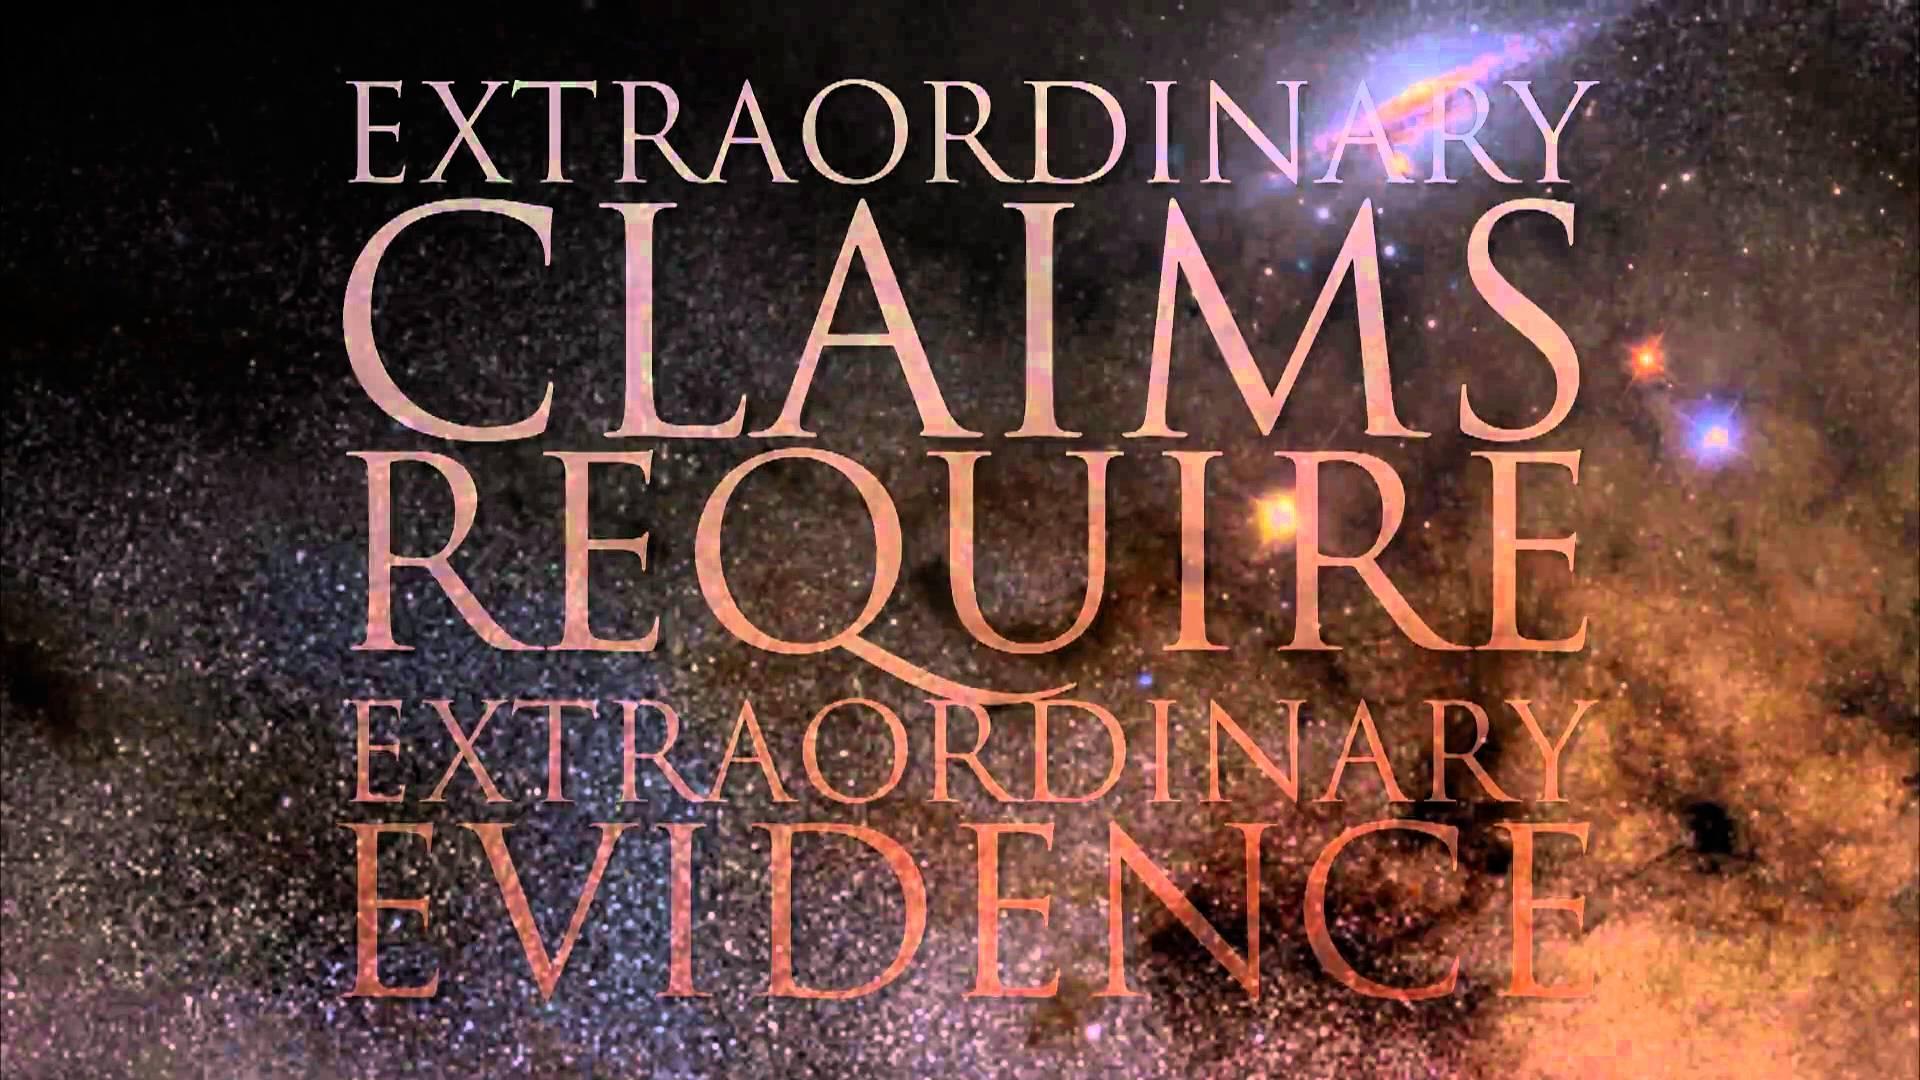 carl sagan - extraordinary claims require extraordinary evidence